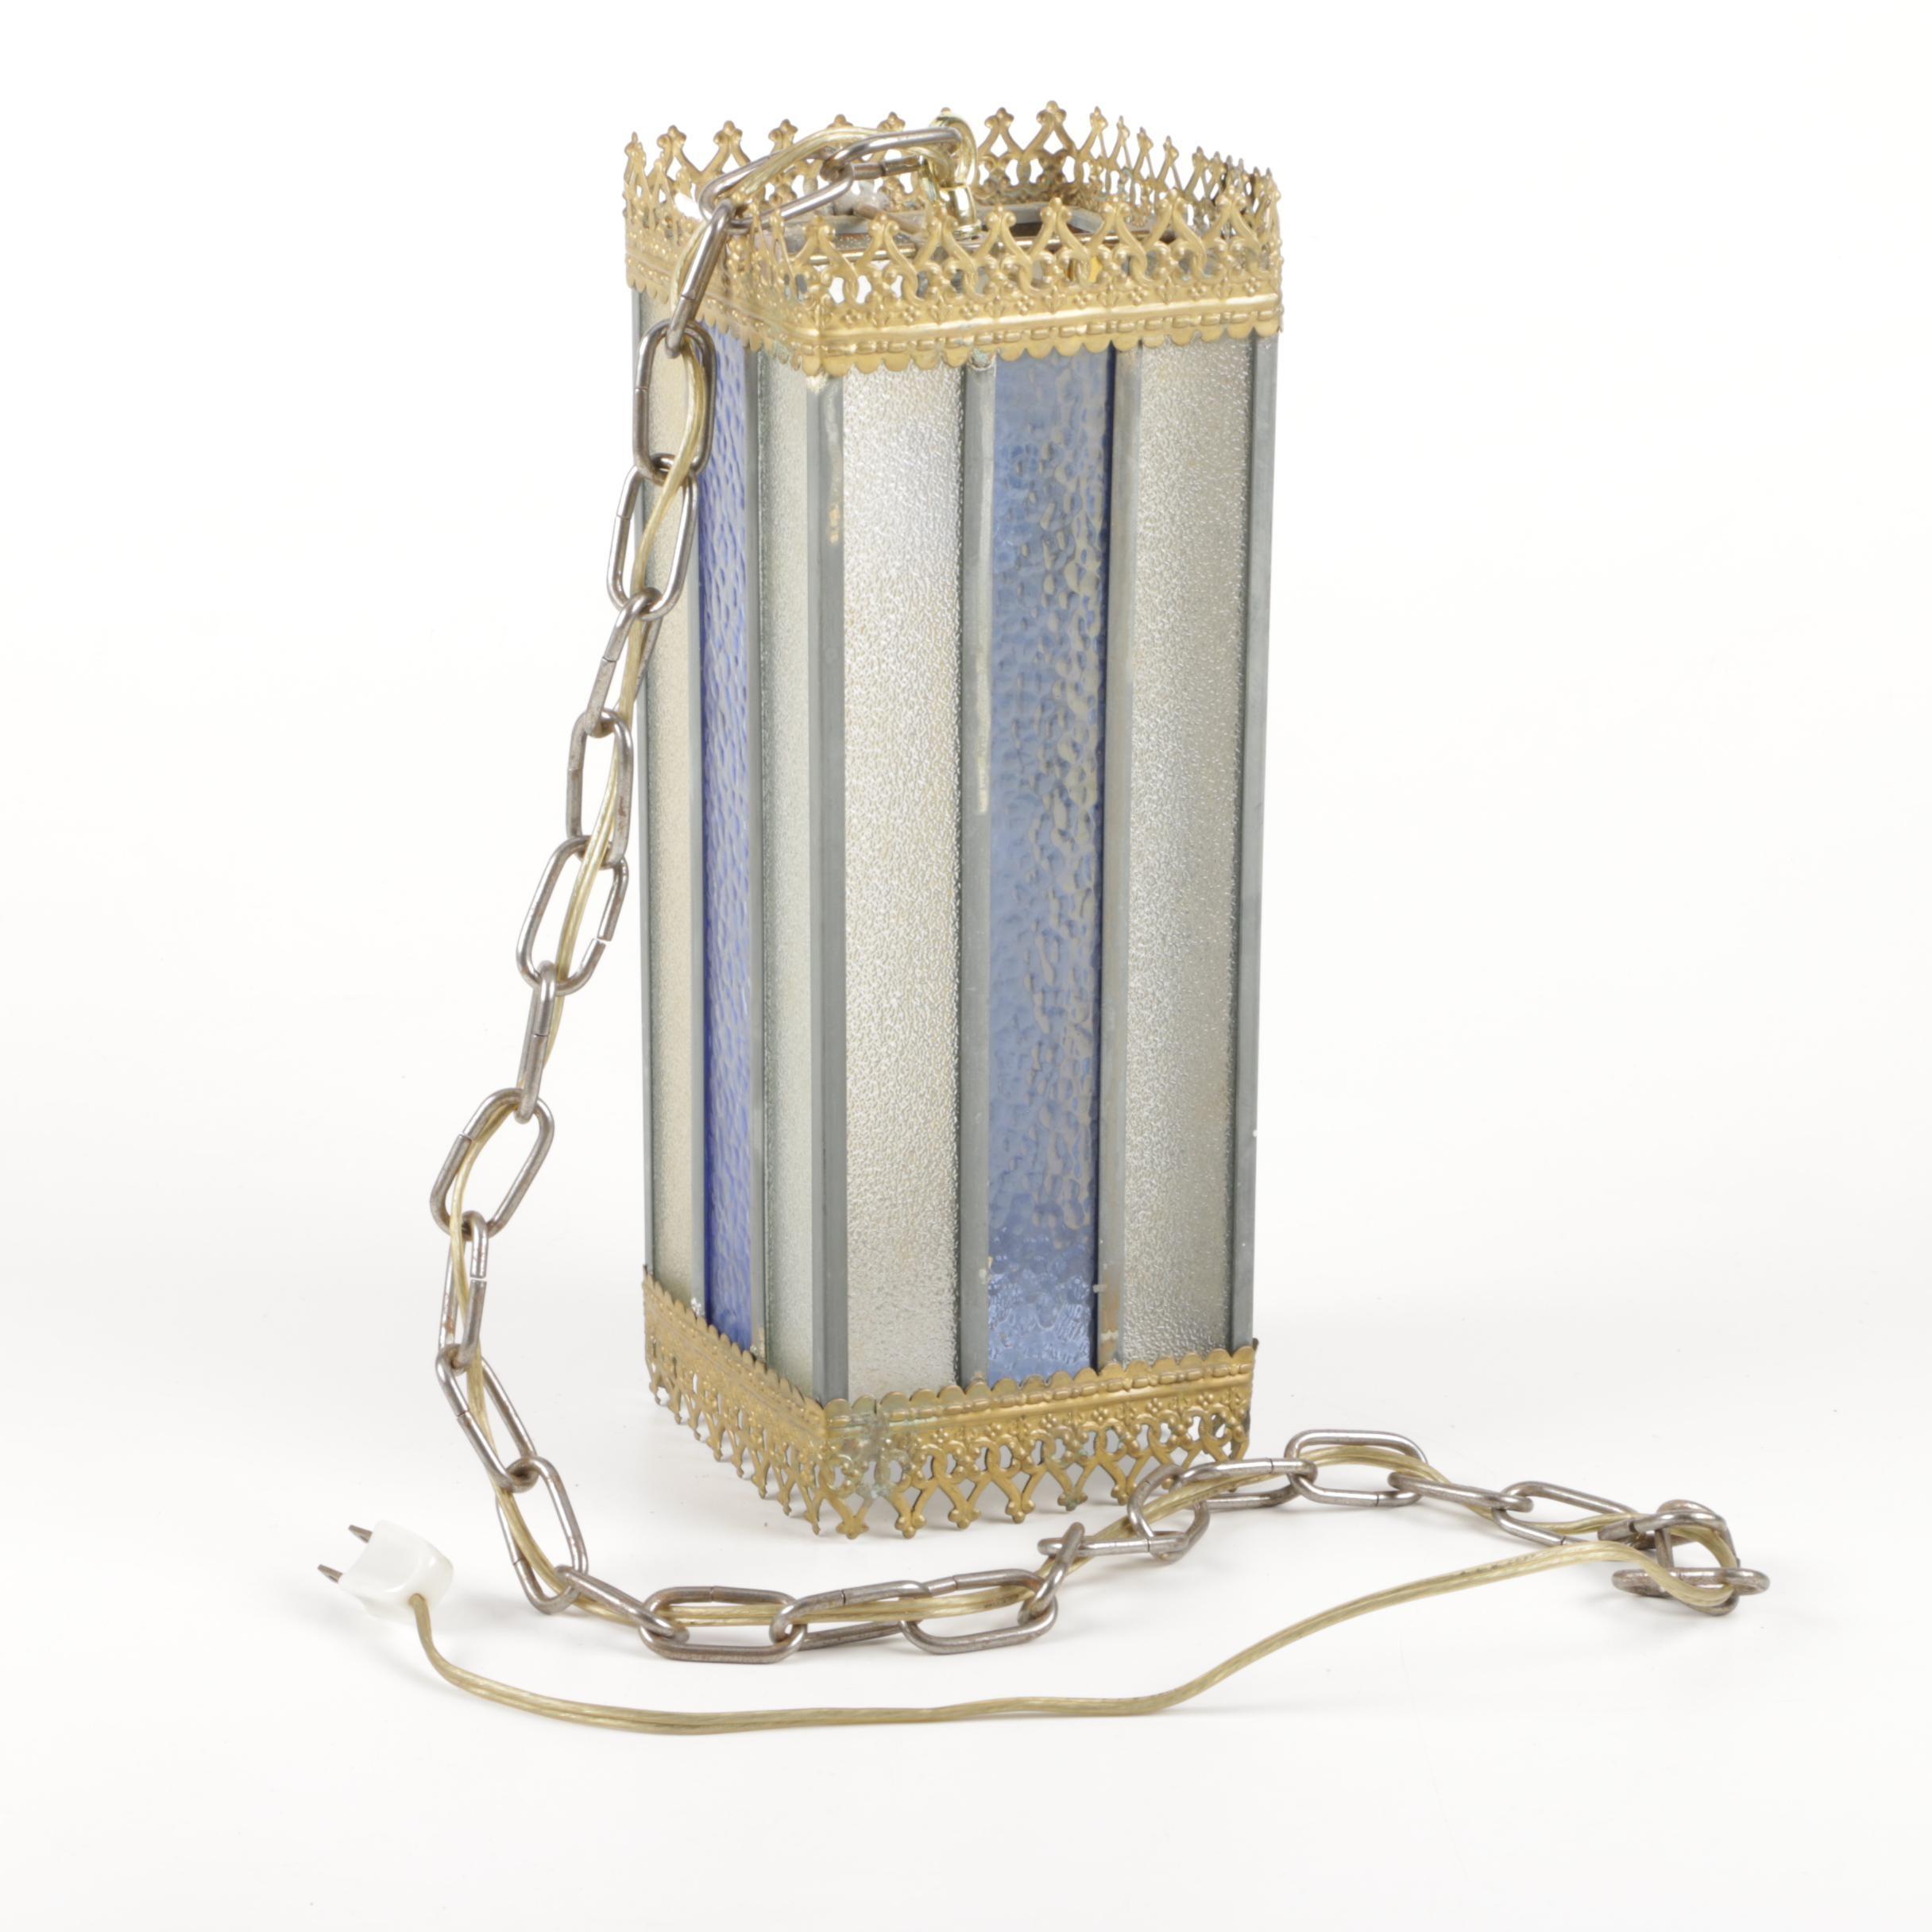 Vintage Metal and Glass Pendant Lamp